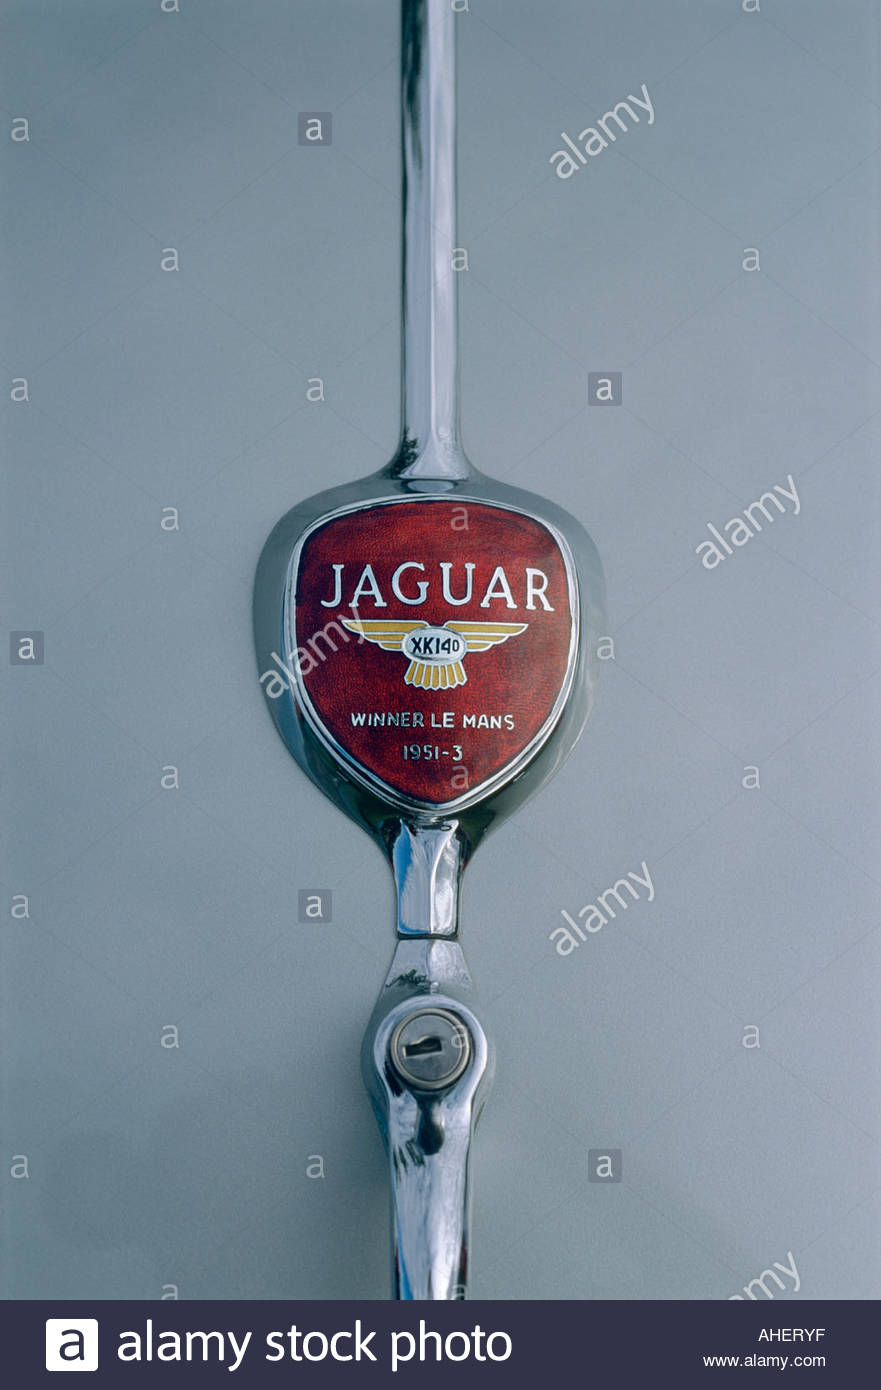 1954 Jaguar XK 140 Roadster Showing the Rear Trunk Lid LeMans Winner 1951 1952 1953 Badge - Stock Image